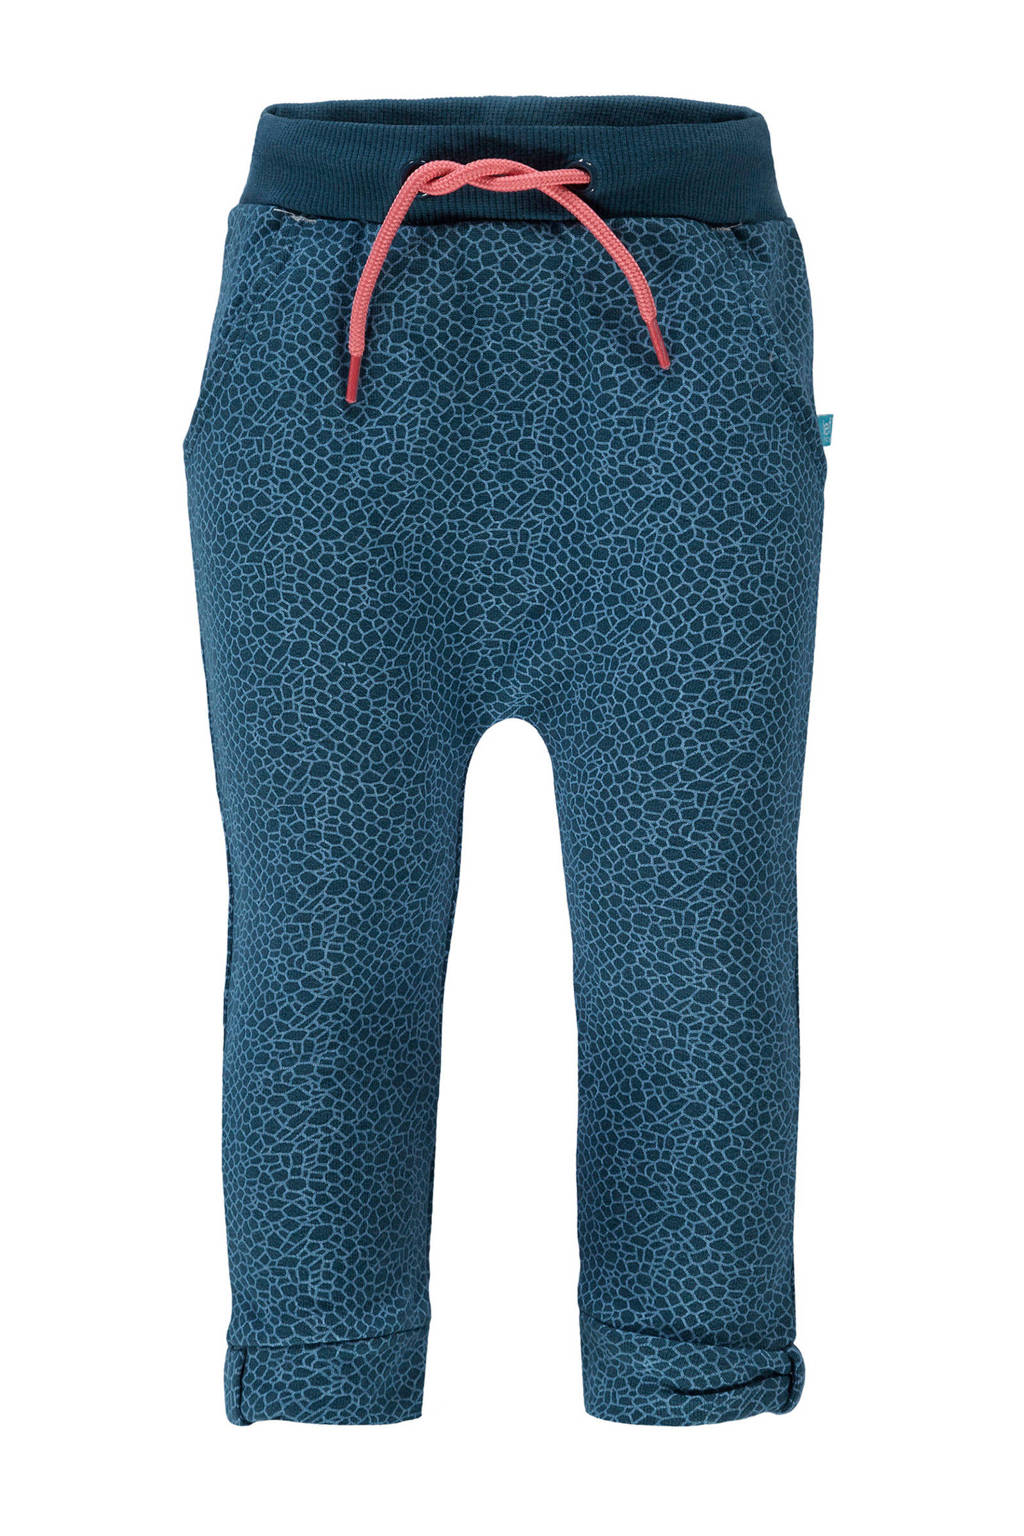 lief! skinny joggingbroek met all over print donkerblauw, Donkerblauw